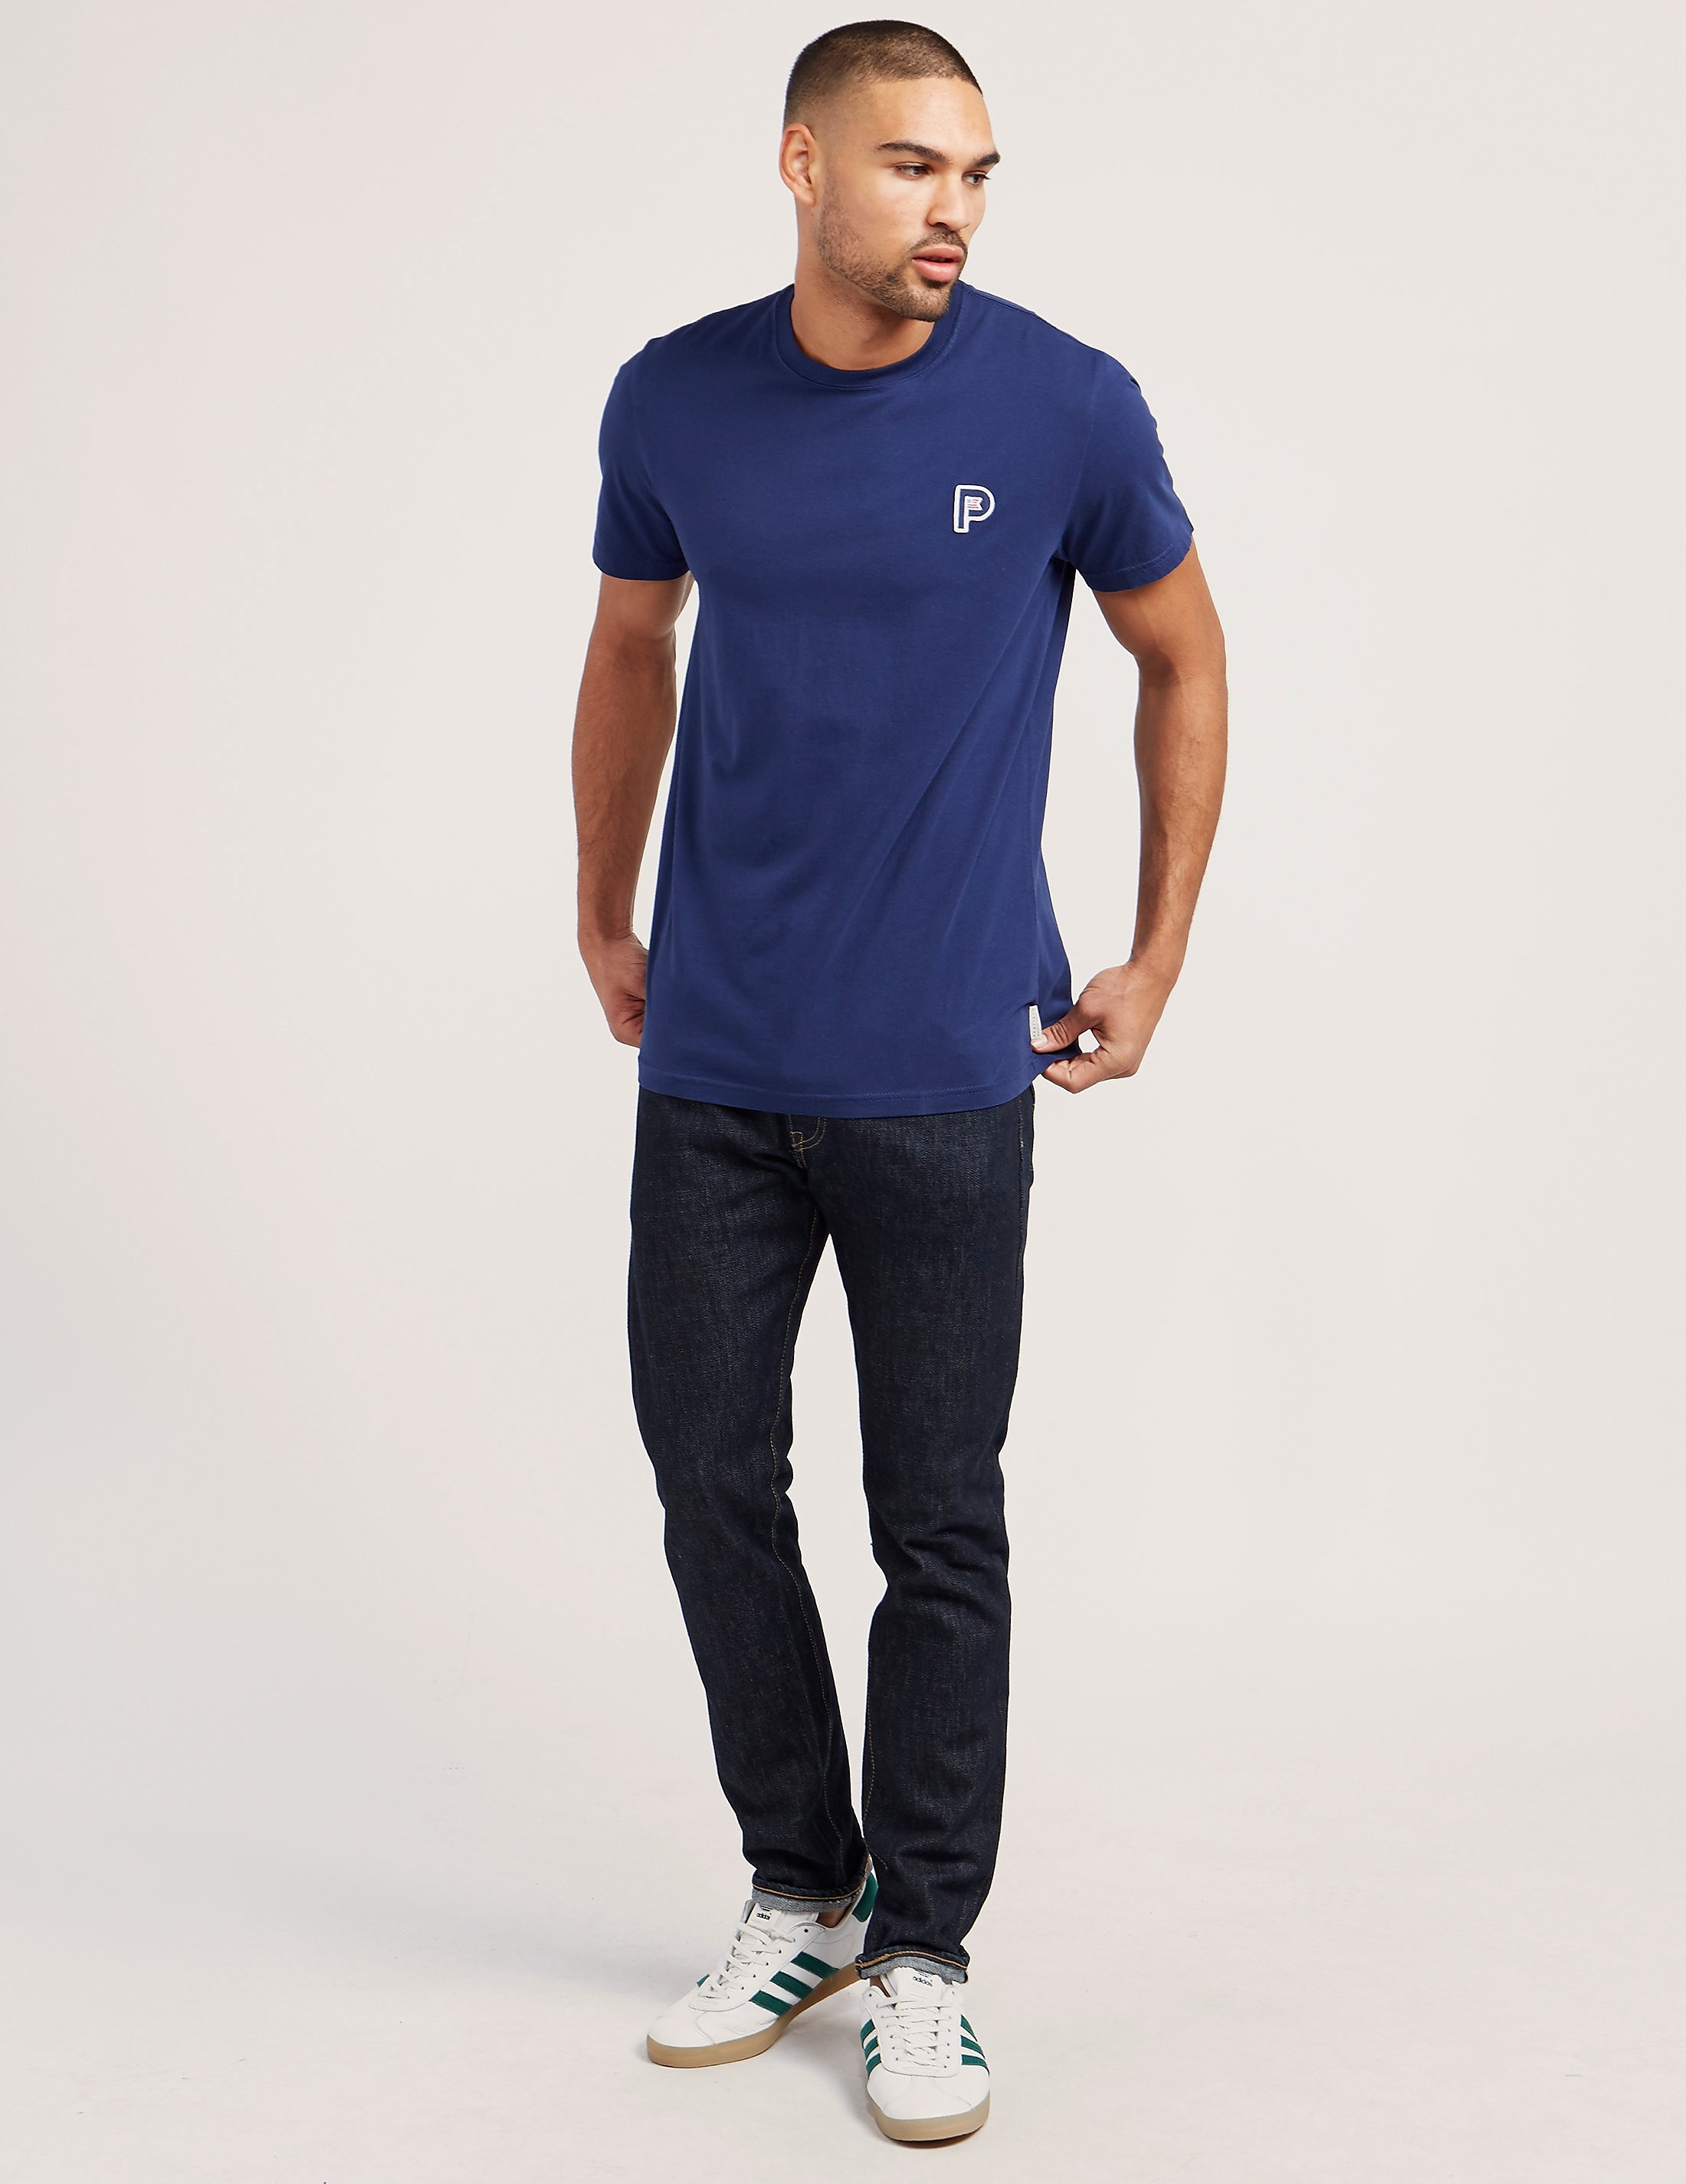 Penfield Peris Logo Short Sleeve T-Shirt